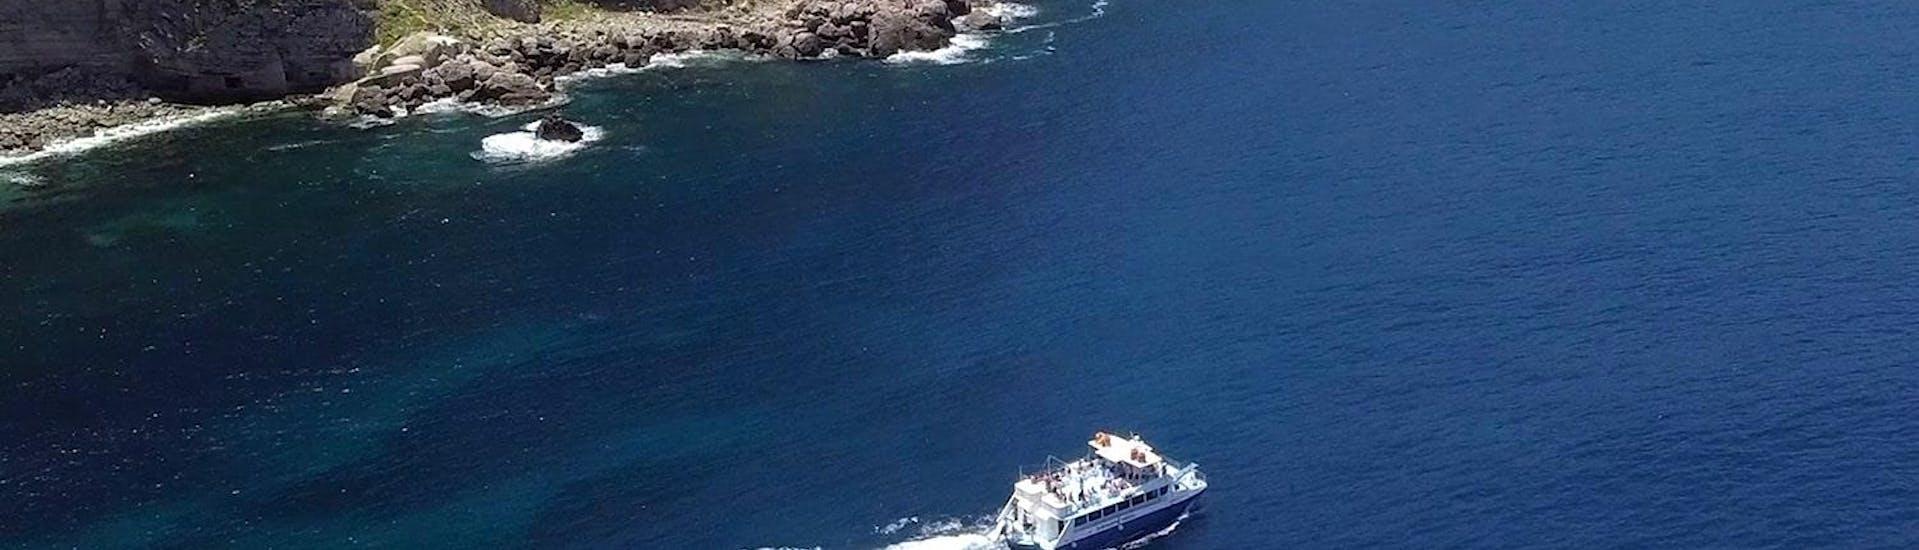 Paseo en Catamarán con Baño en Cala Bassa y Cala Conta